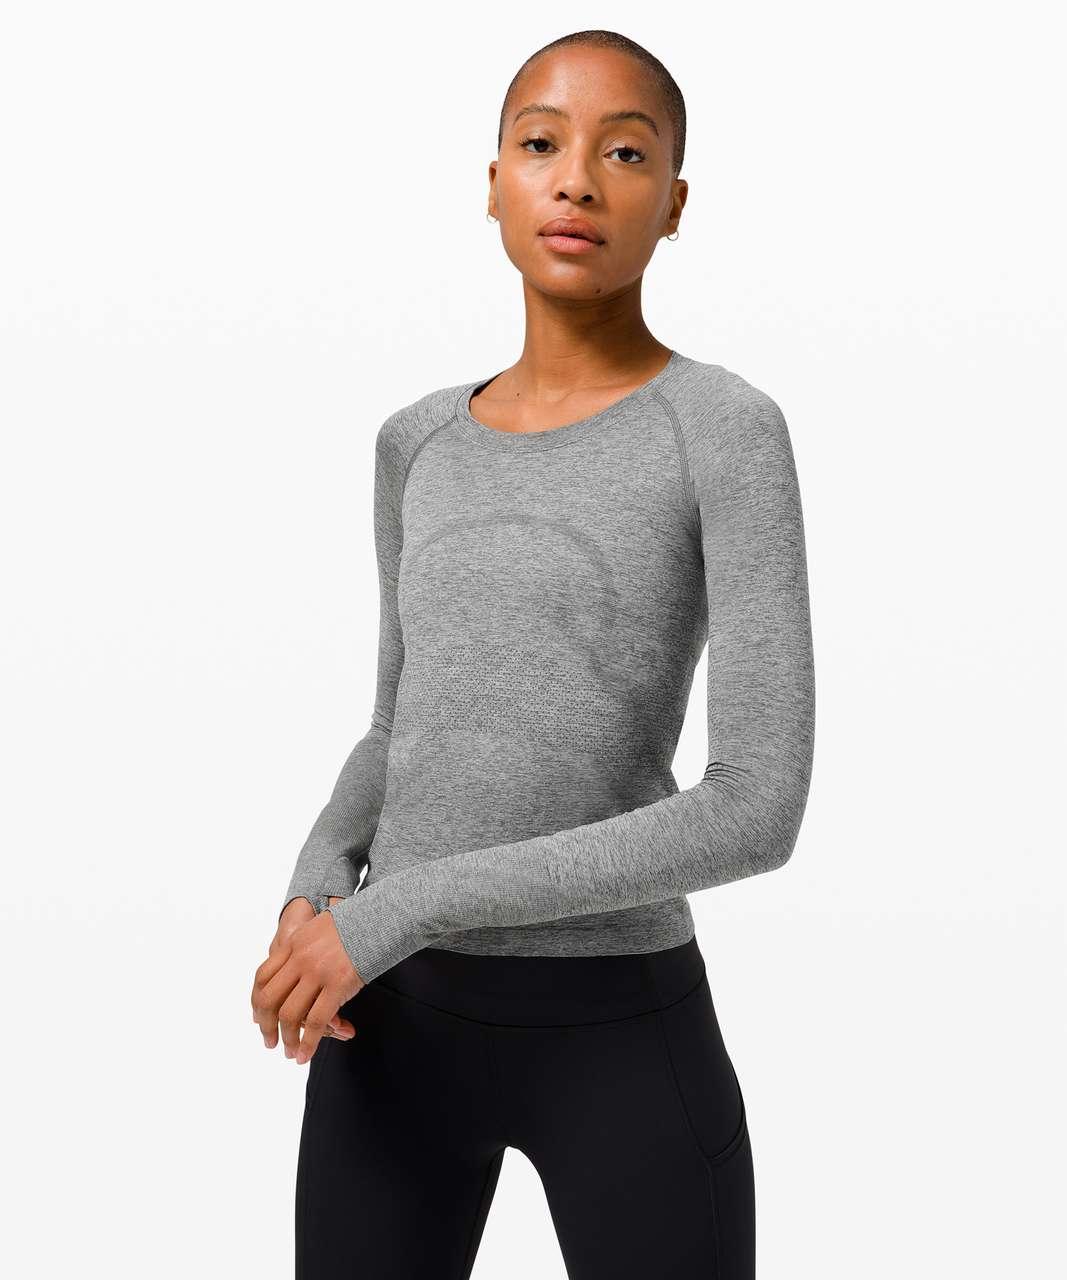 Lululemon Swiftly Tech Long Sleeve 2.0 *Race Length - Graphite Grey / Silver Drop